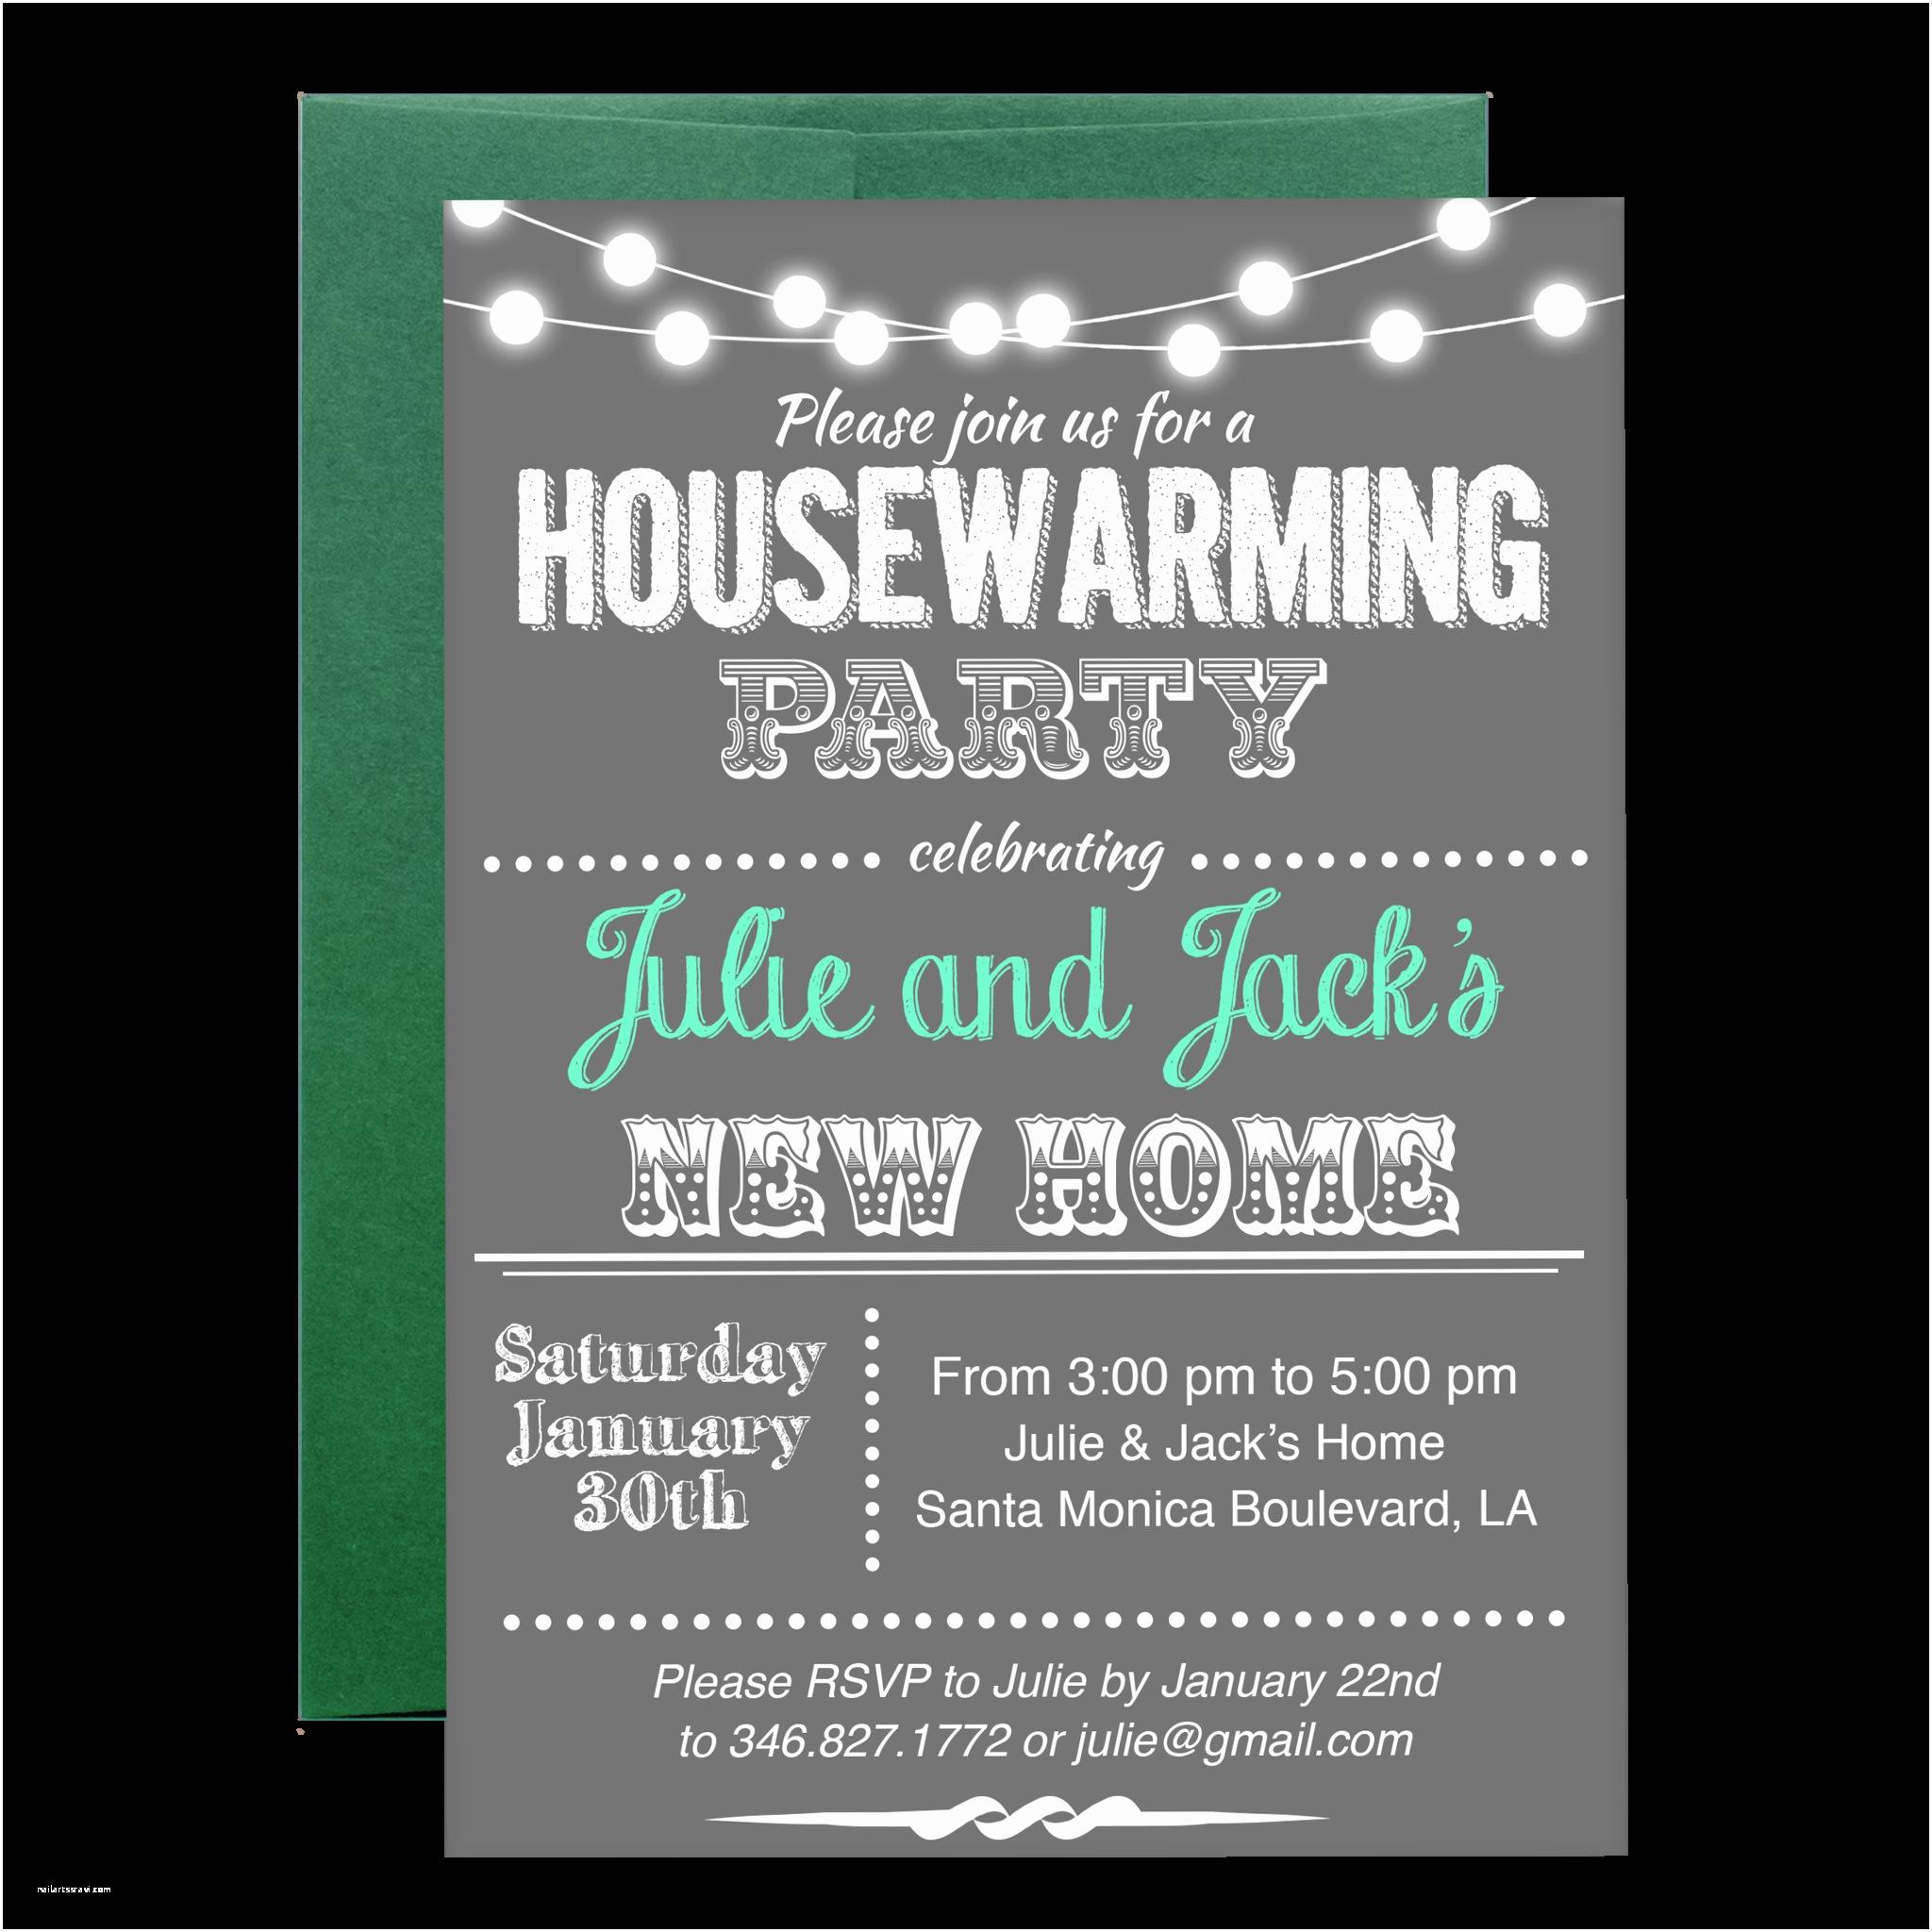 Housewarming Party Invitation Template Housewarming Invitation Clipart